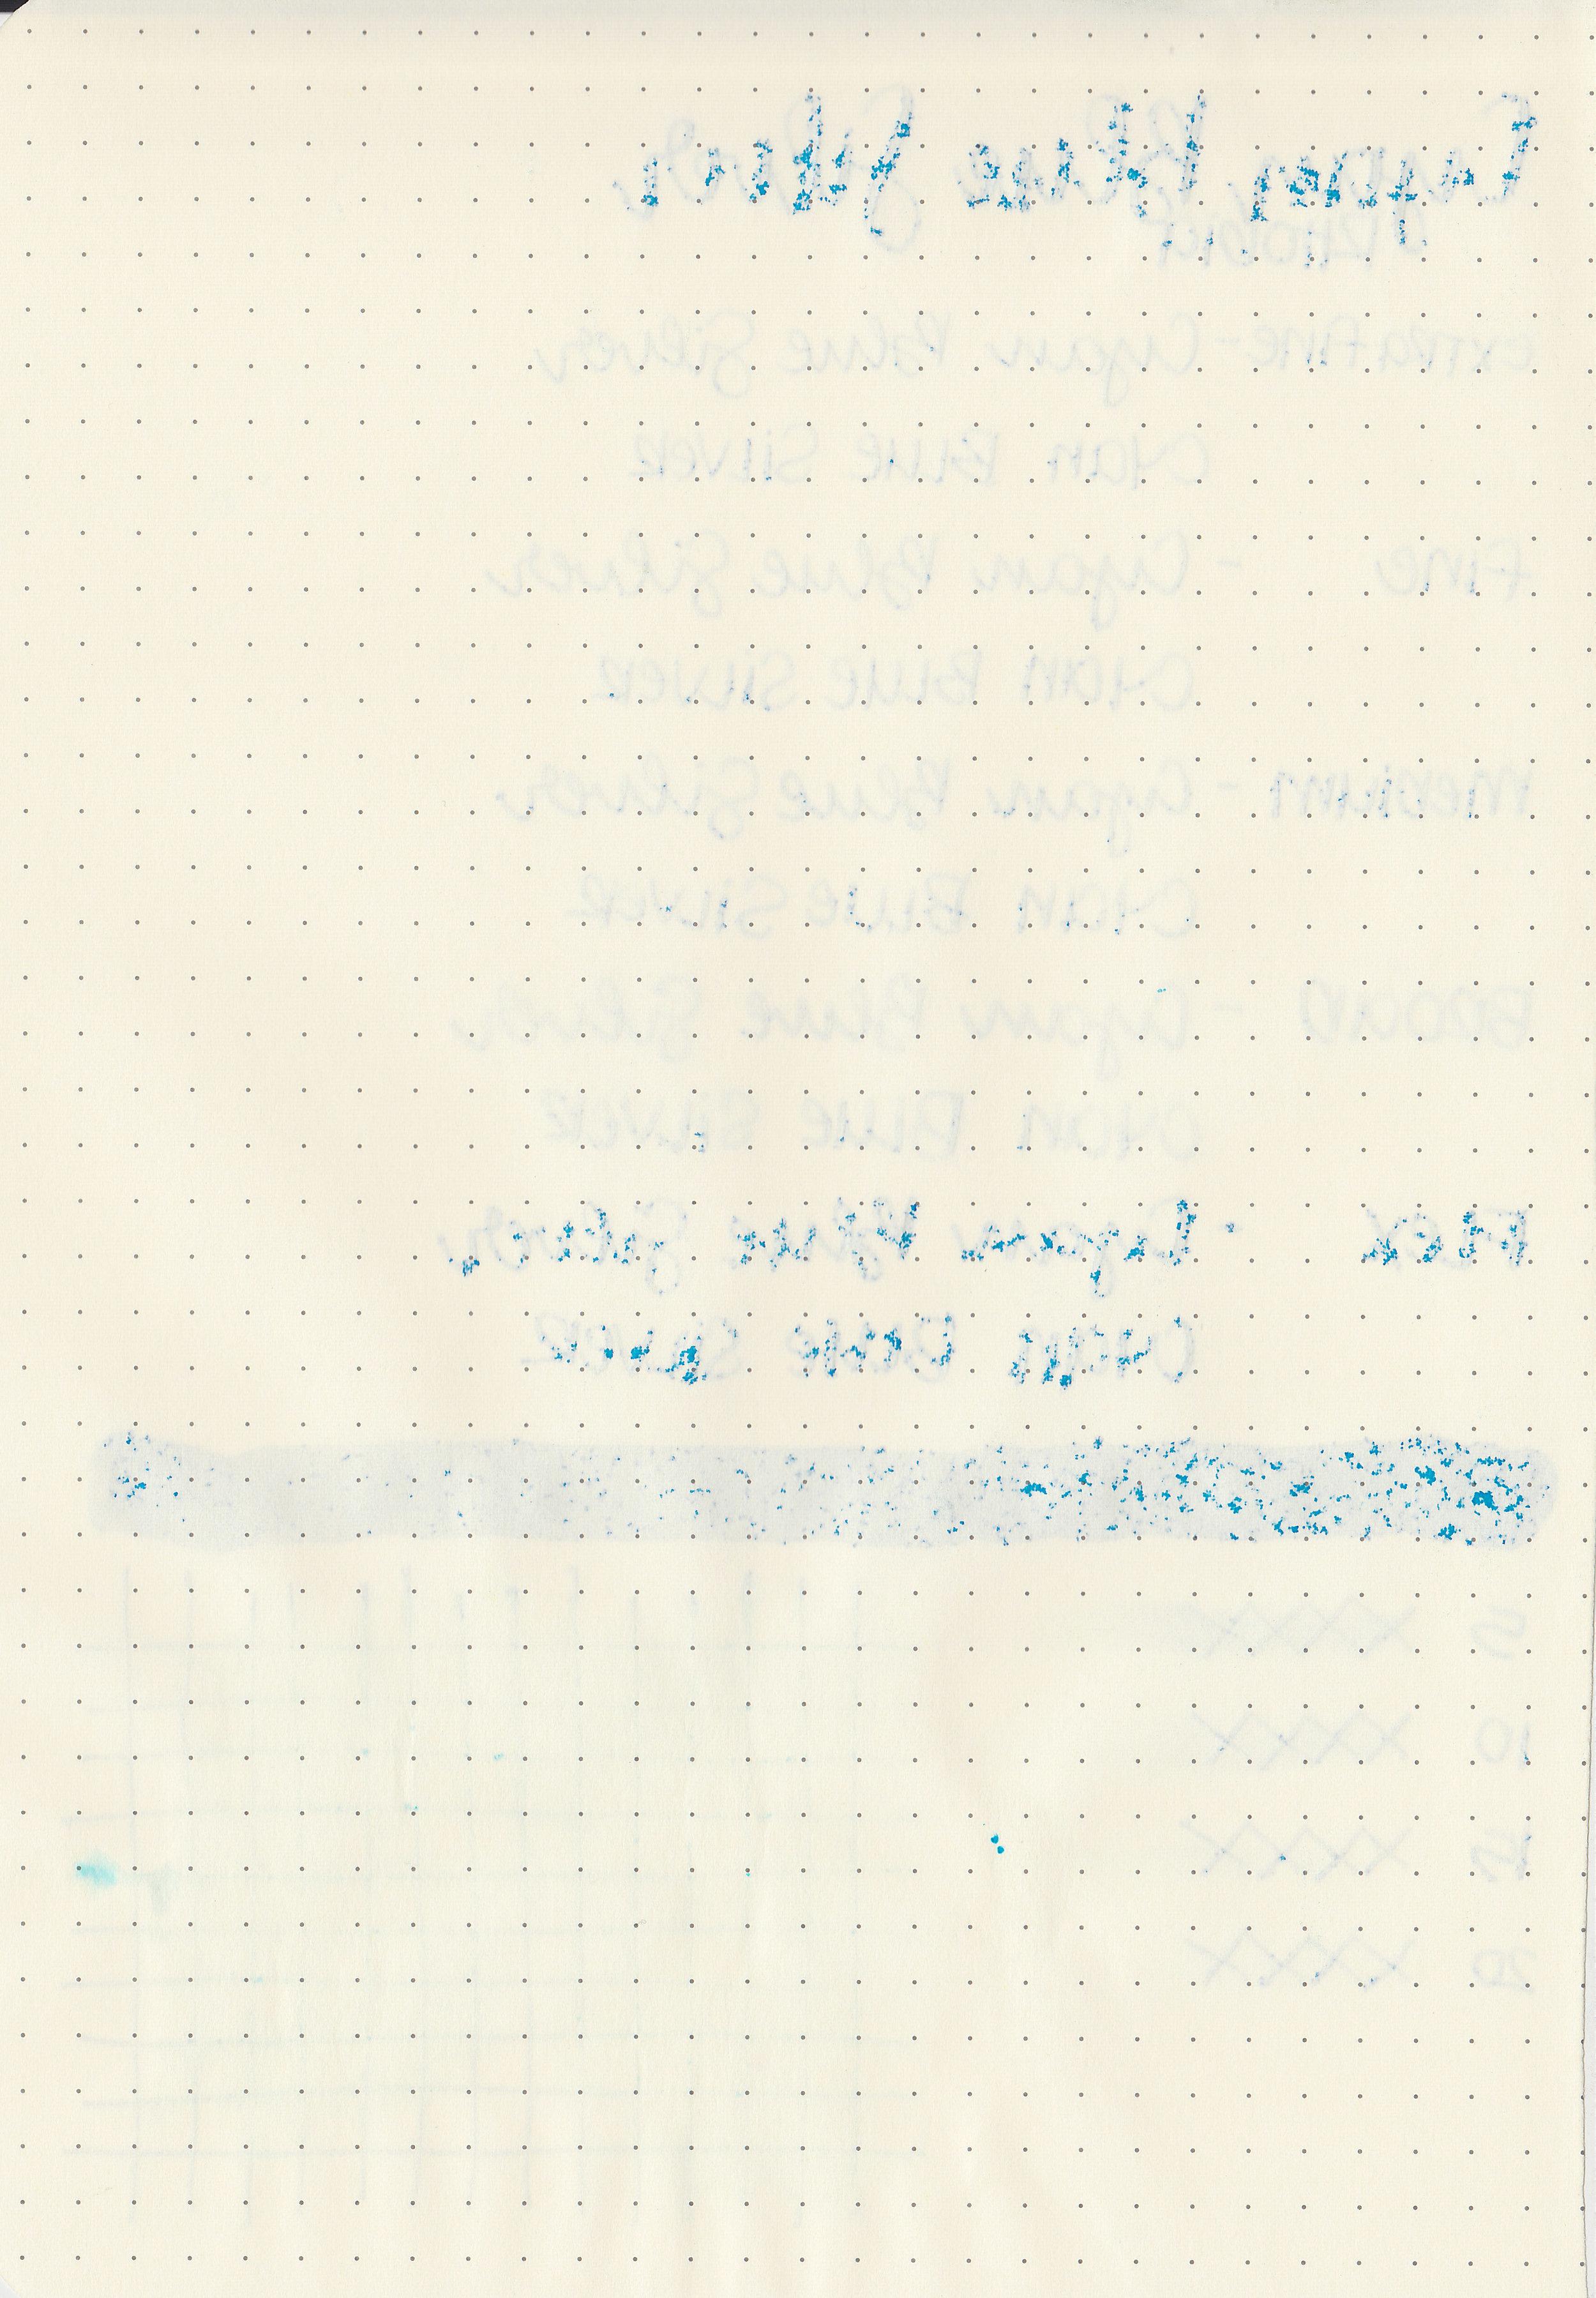 da-cyan-blue-9.jpg